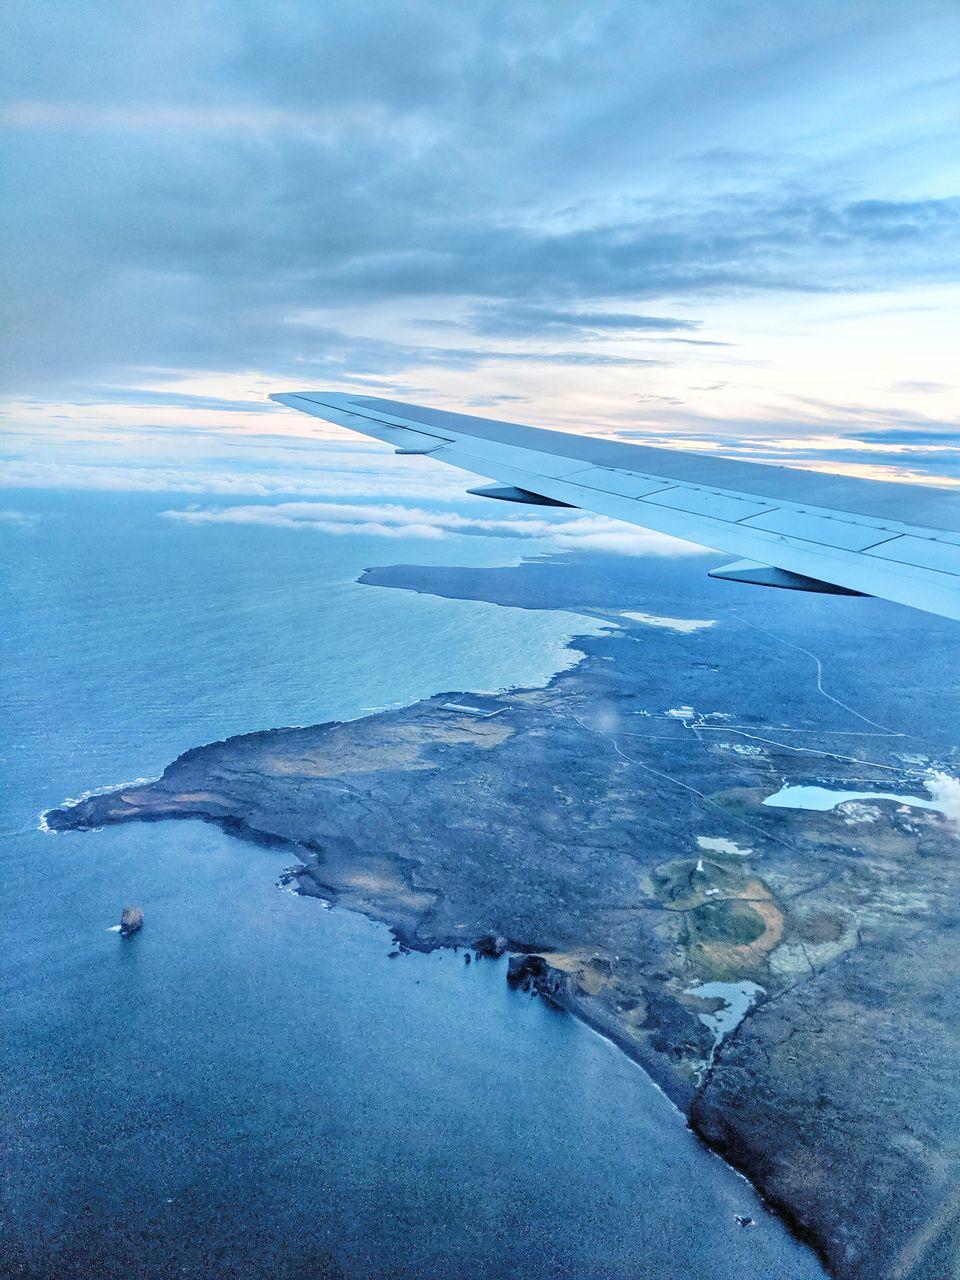 Photo of Icelandic Adventure - Nordic Honeymoon 1/1 by Sudipta Nandy